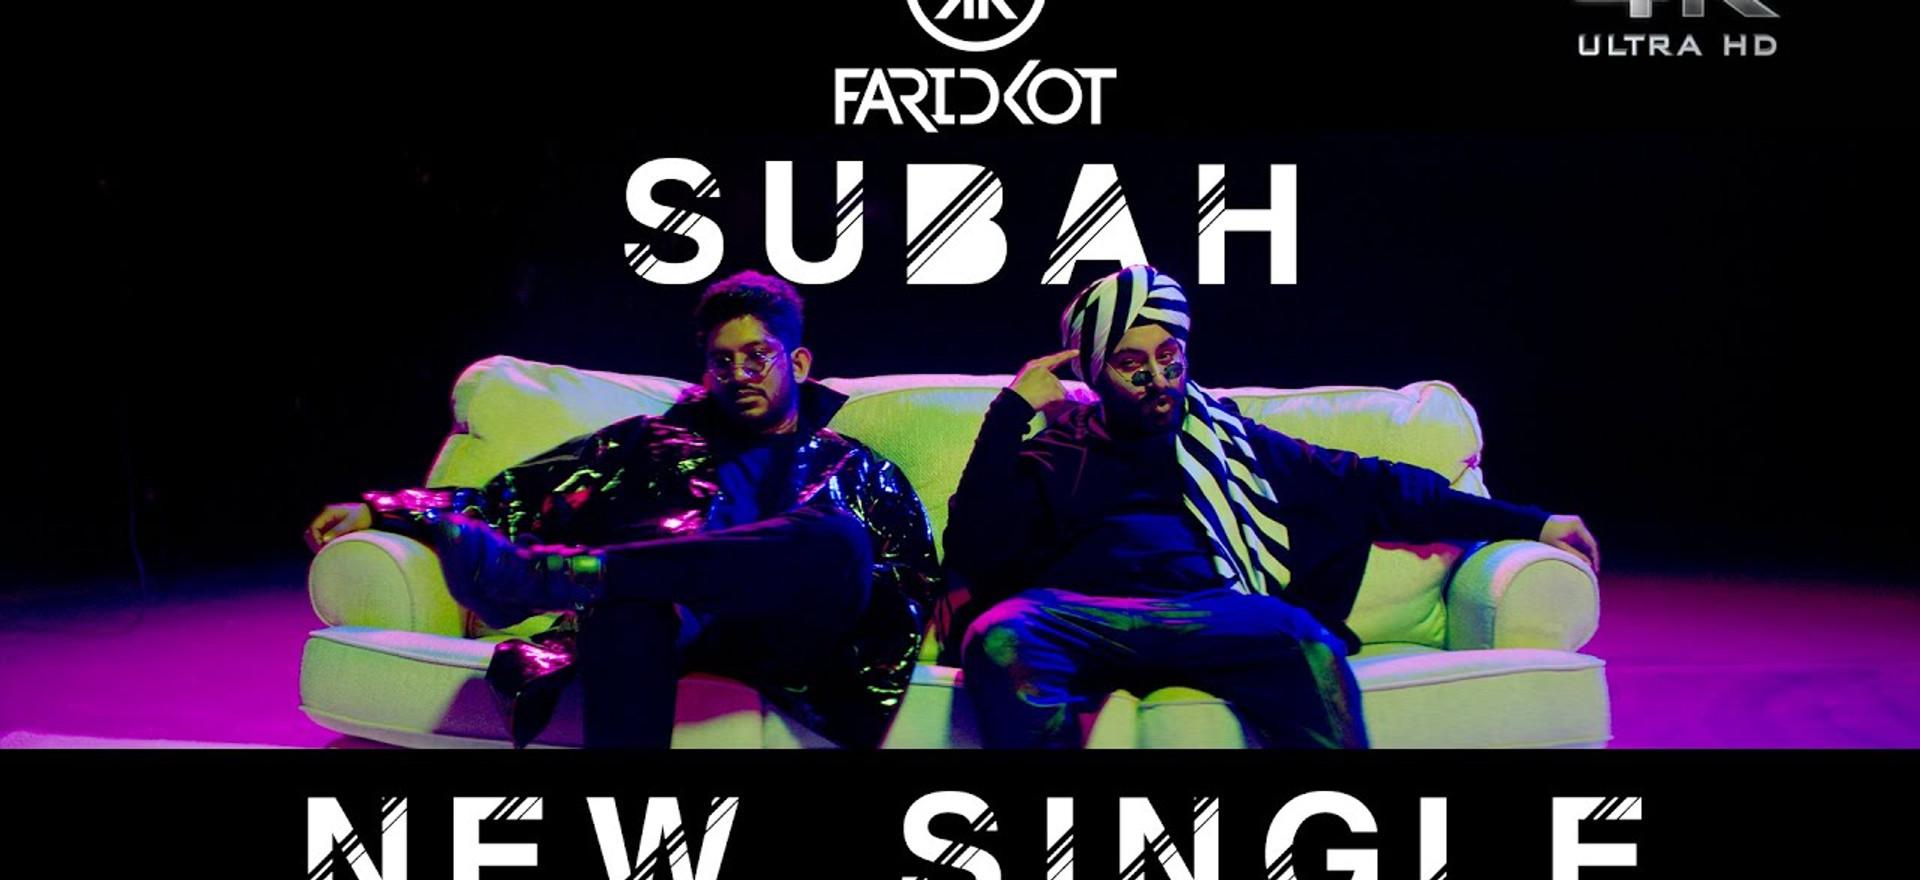 Faridkot SUBAH (Official Video) | Feat. Pavithra